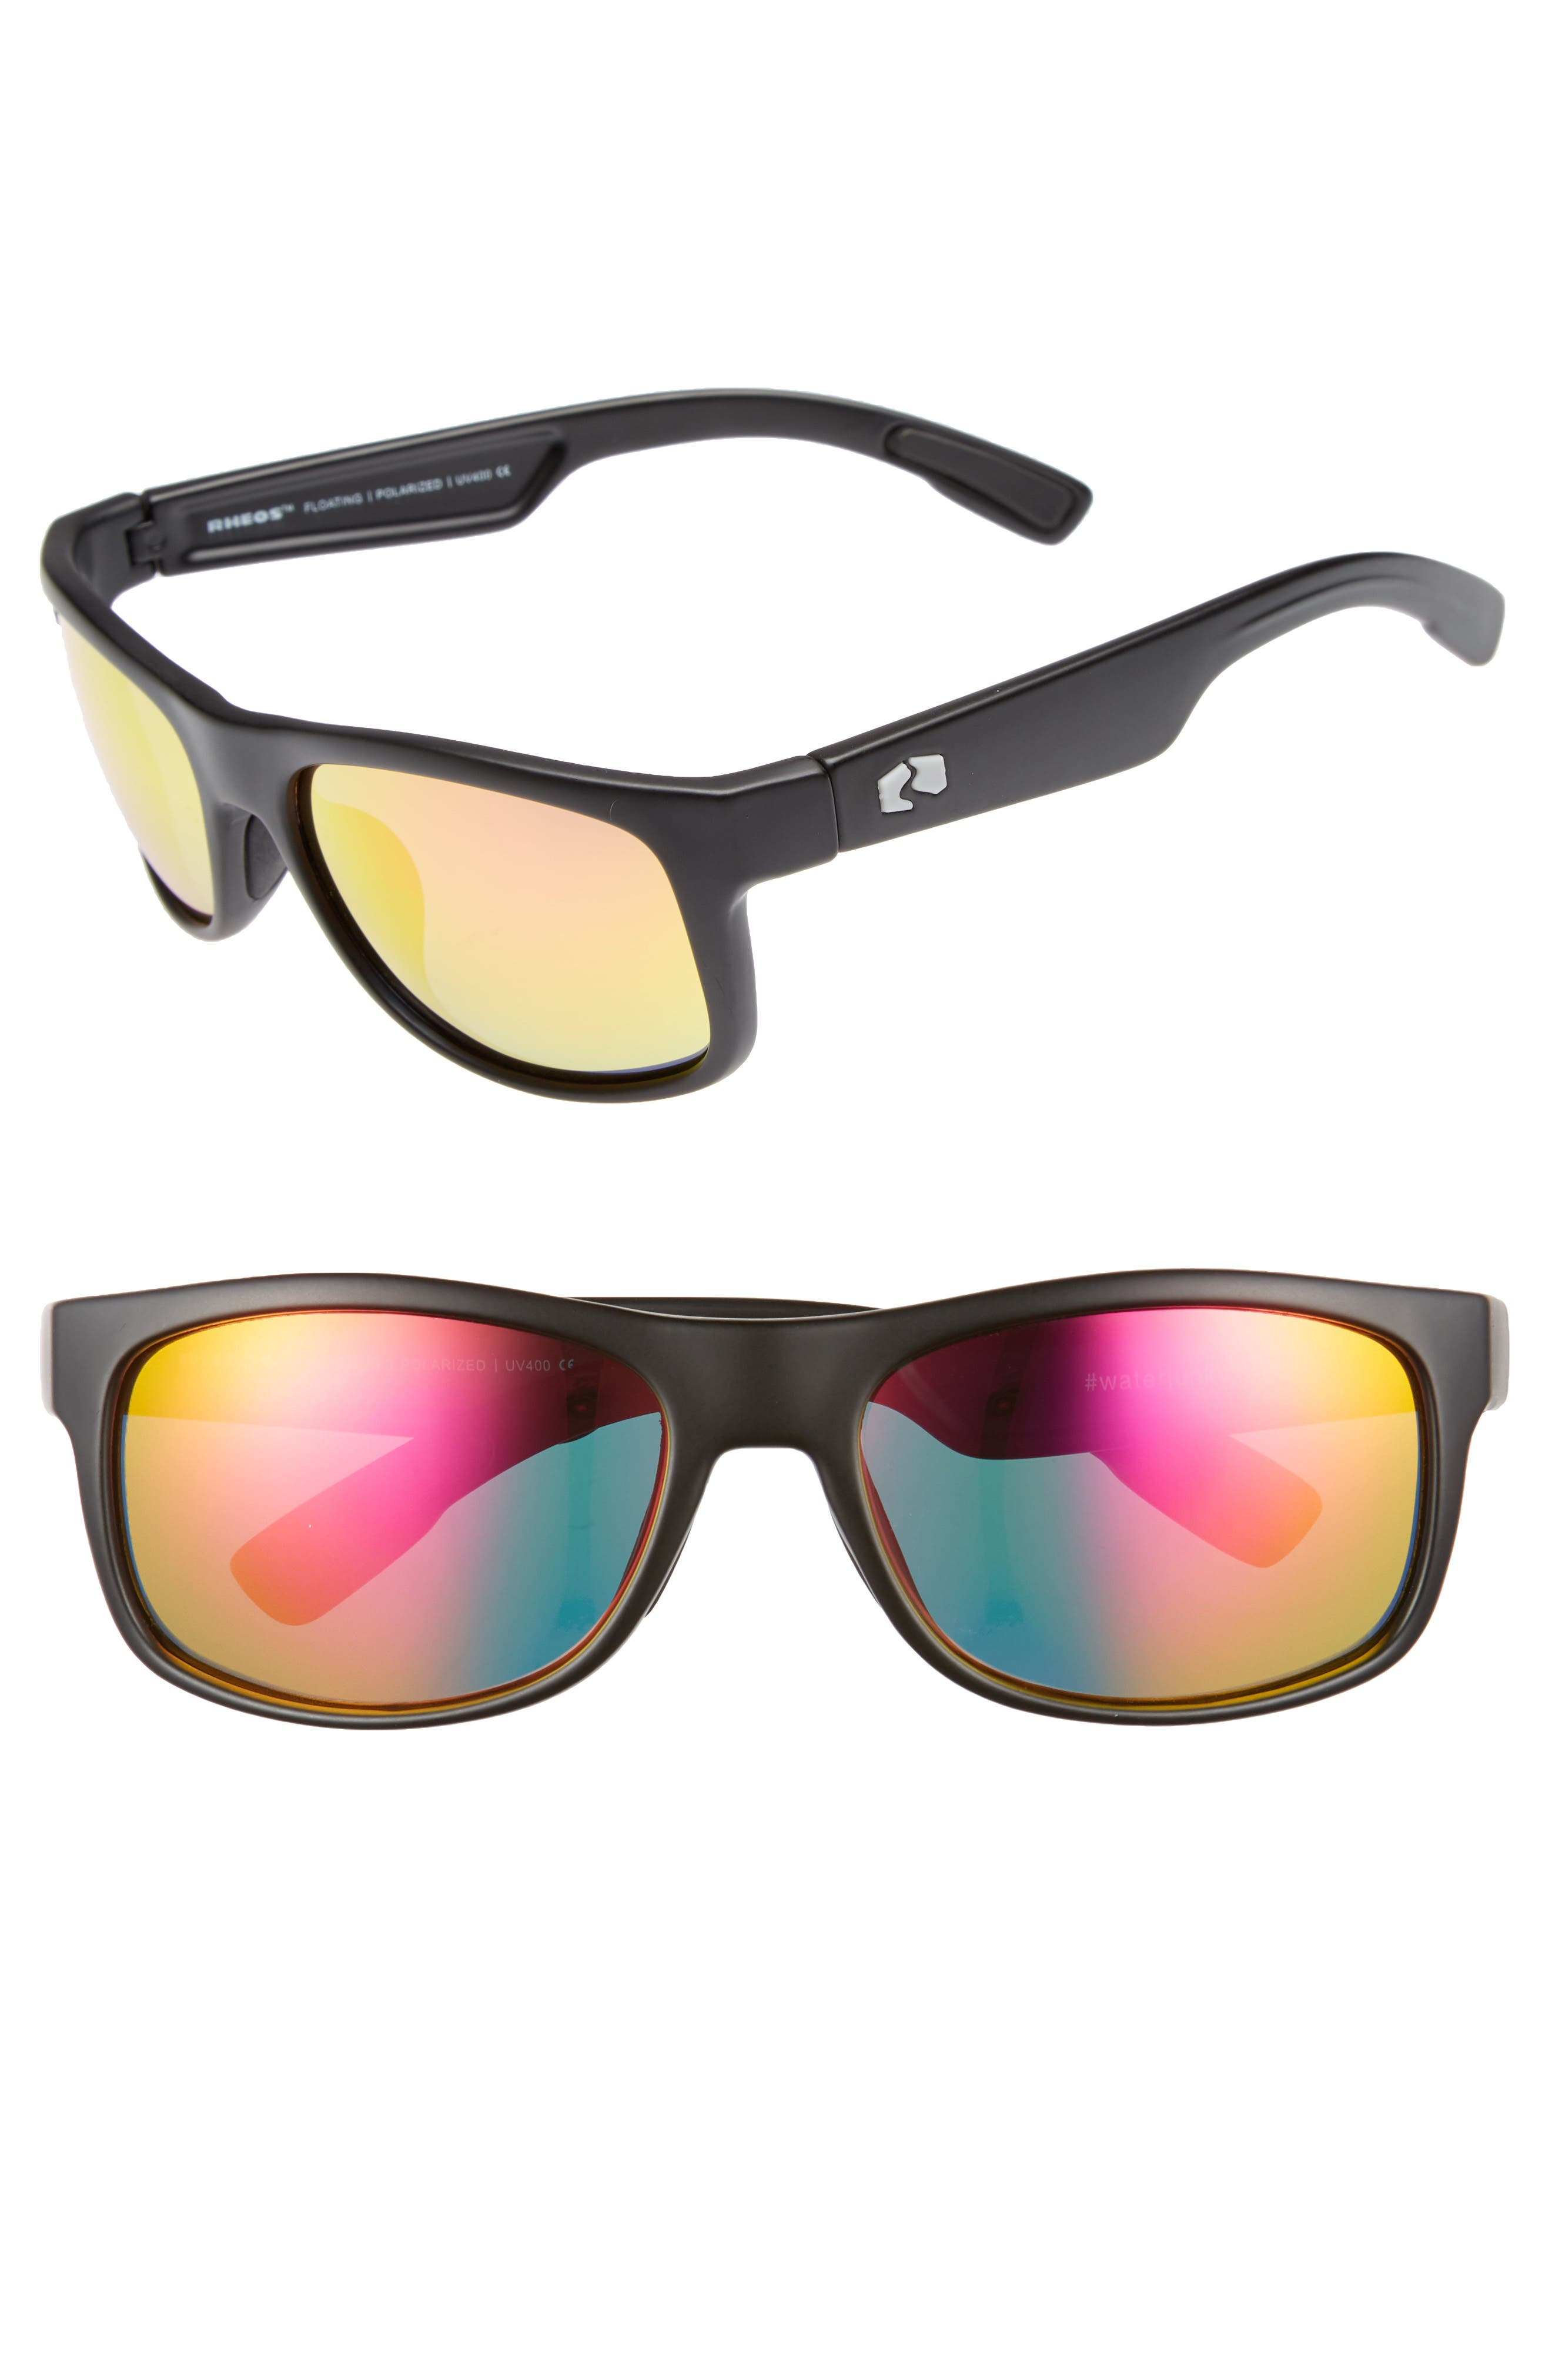 Rheos Anhingas Floating 59mm Polarized Sunglasses